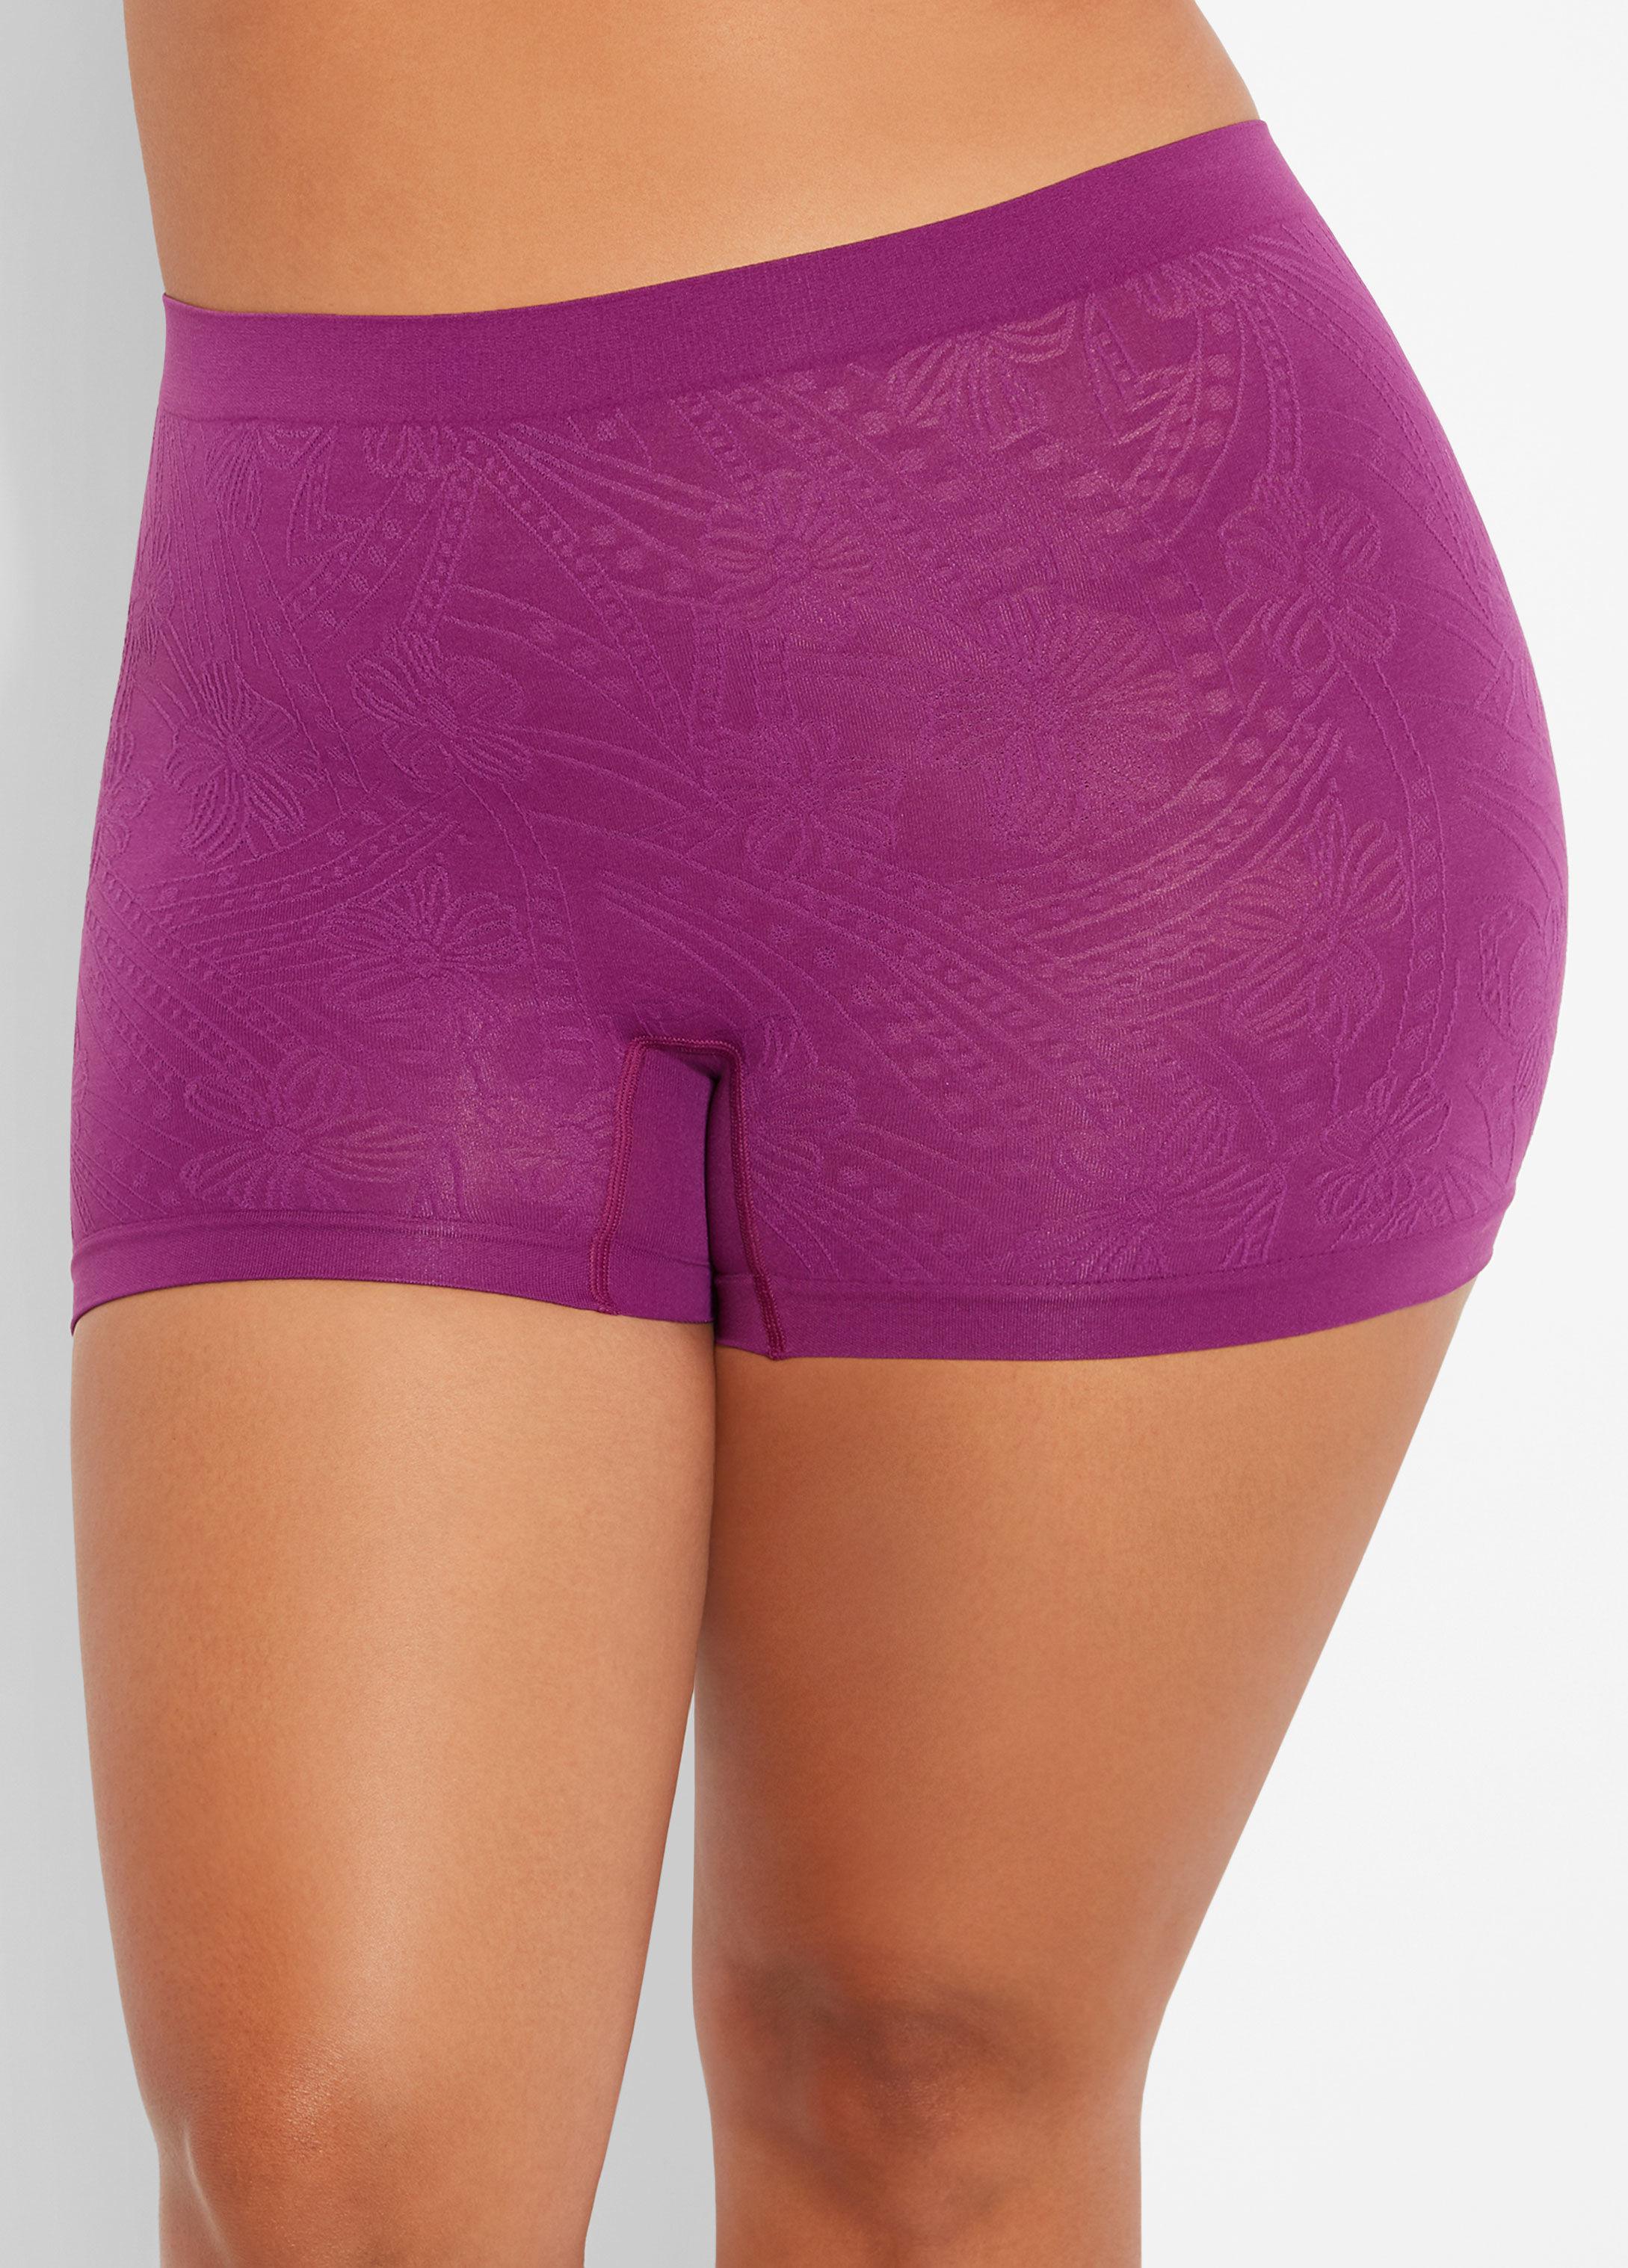 c6faa252bce Lyst - Ashley Stewart Plus Size Seamless Jacquard Boyshort Panty in ...